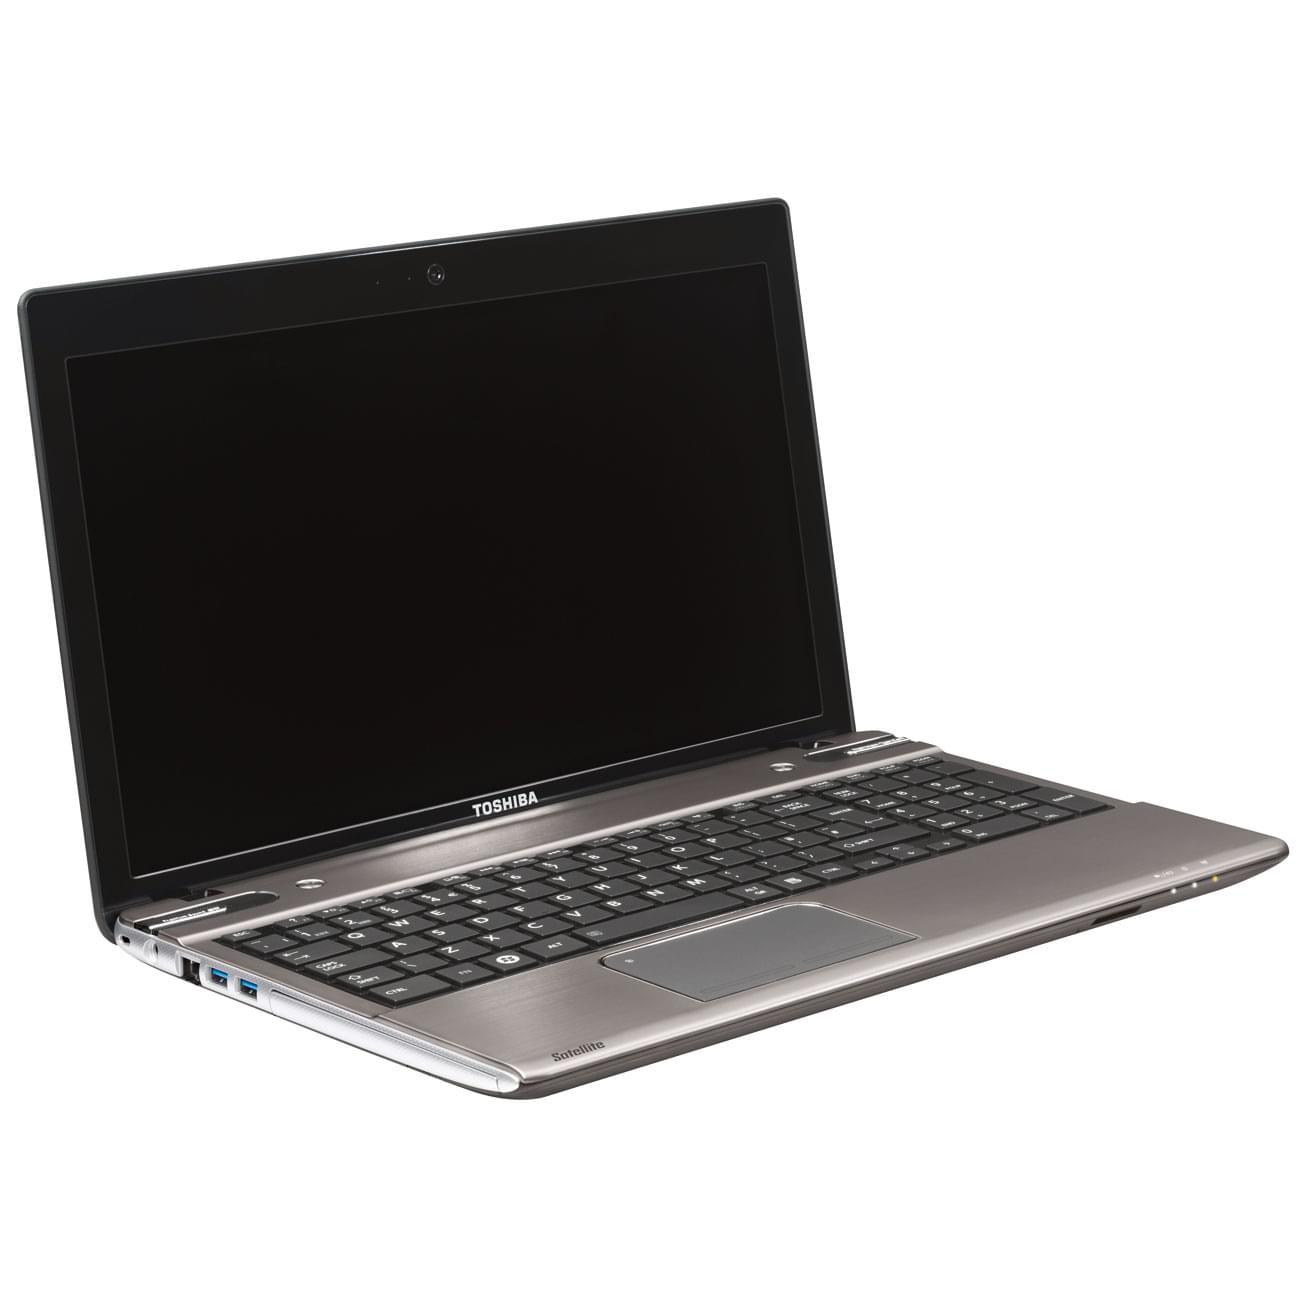 Toshiba P850-30H (PSPKBE-05400CFR solde) - Achat / Vente PC Portable sur Cybertek.fr - 0